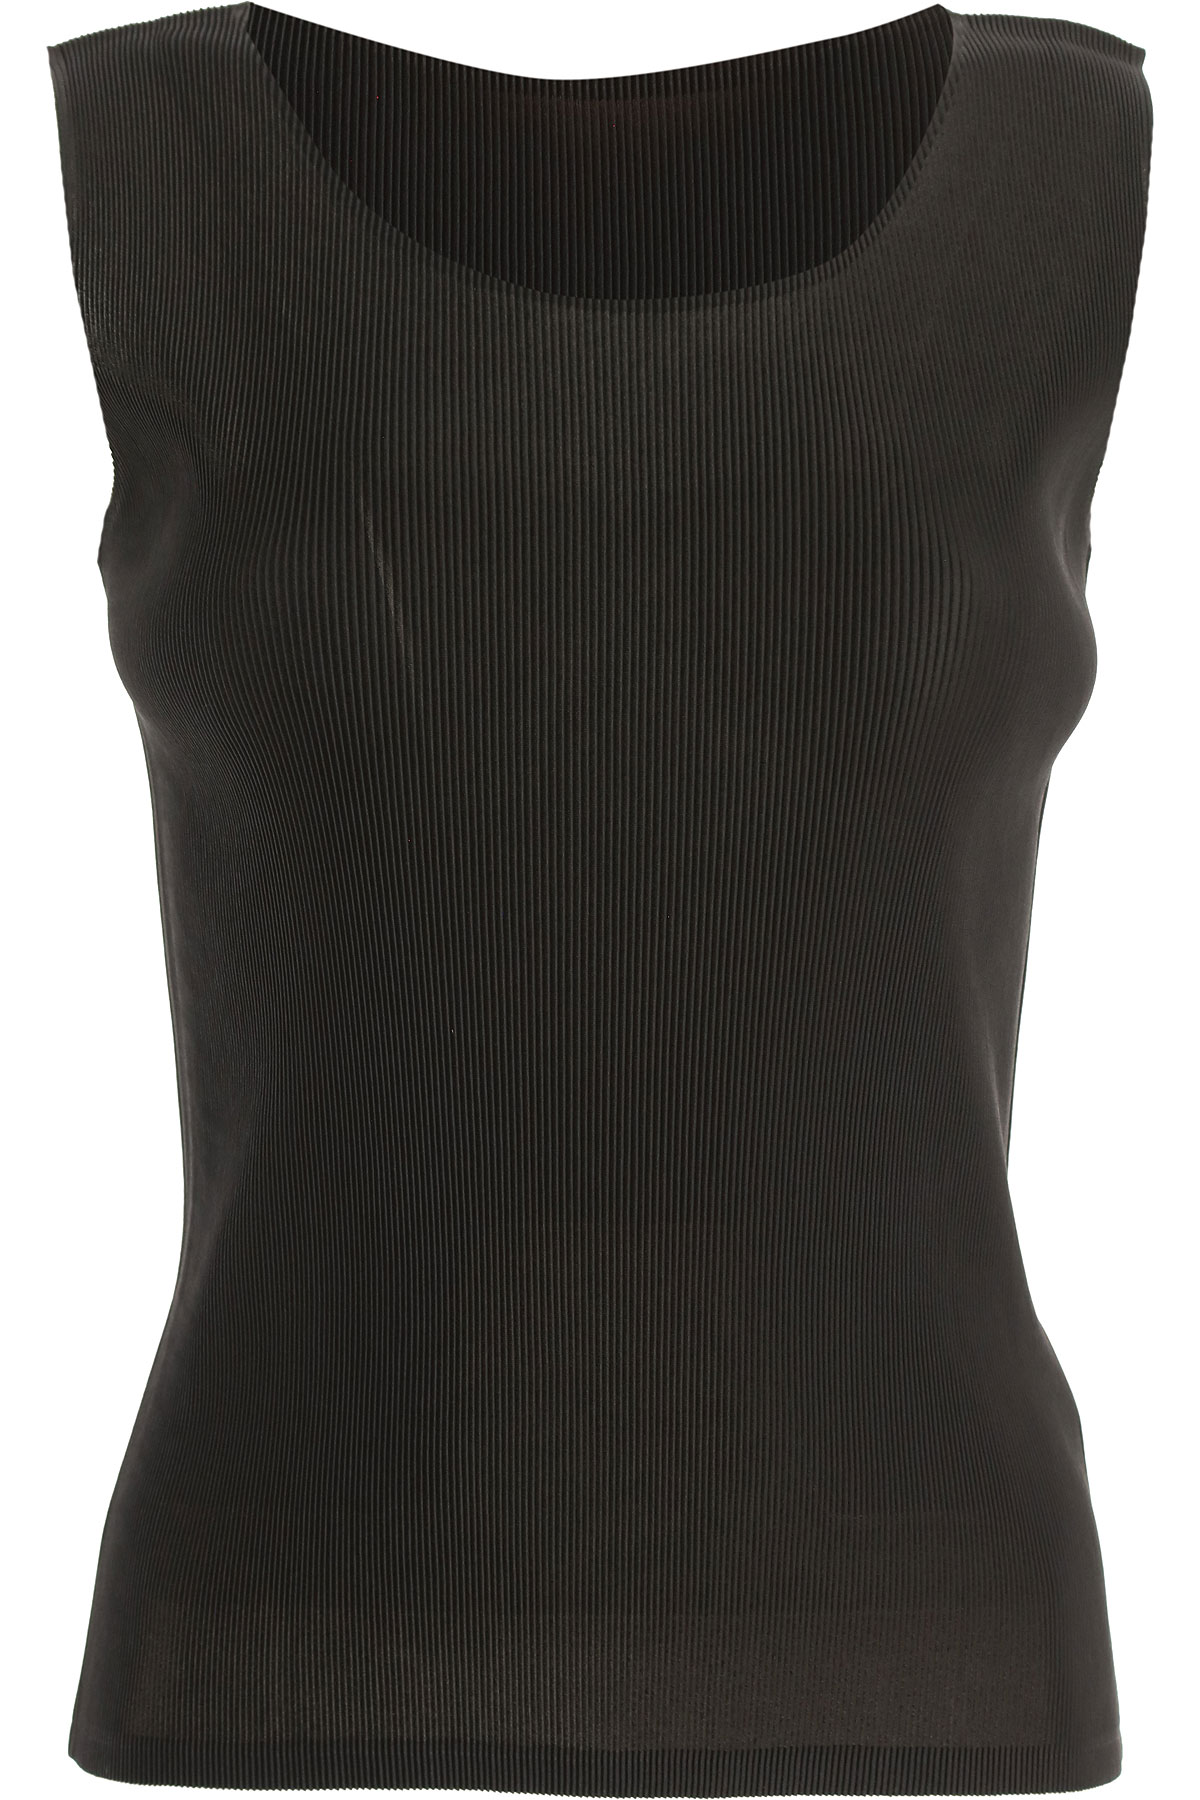 Pleats Please Top for Women On Sale, Black, polyester, 2019, 3-161/165cm 5-171/175cm